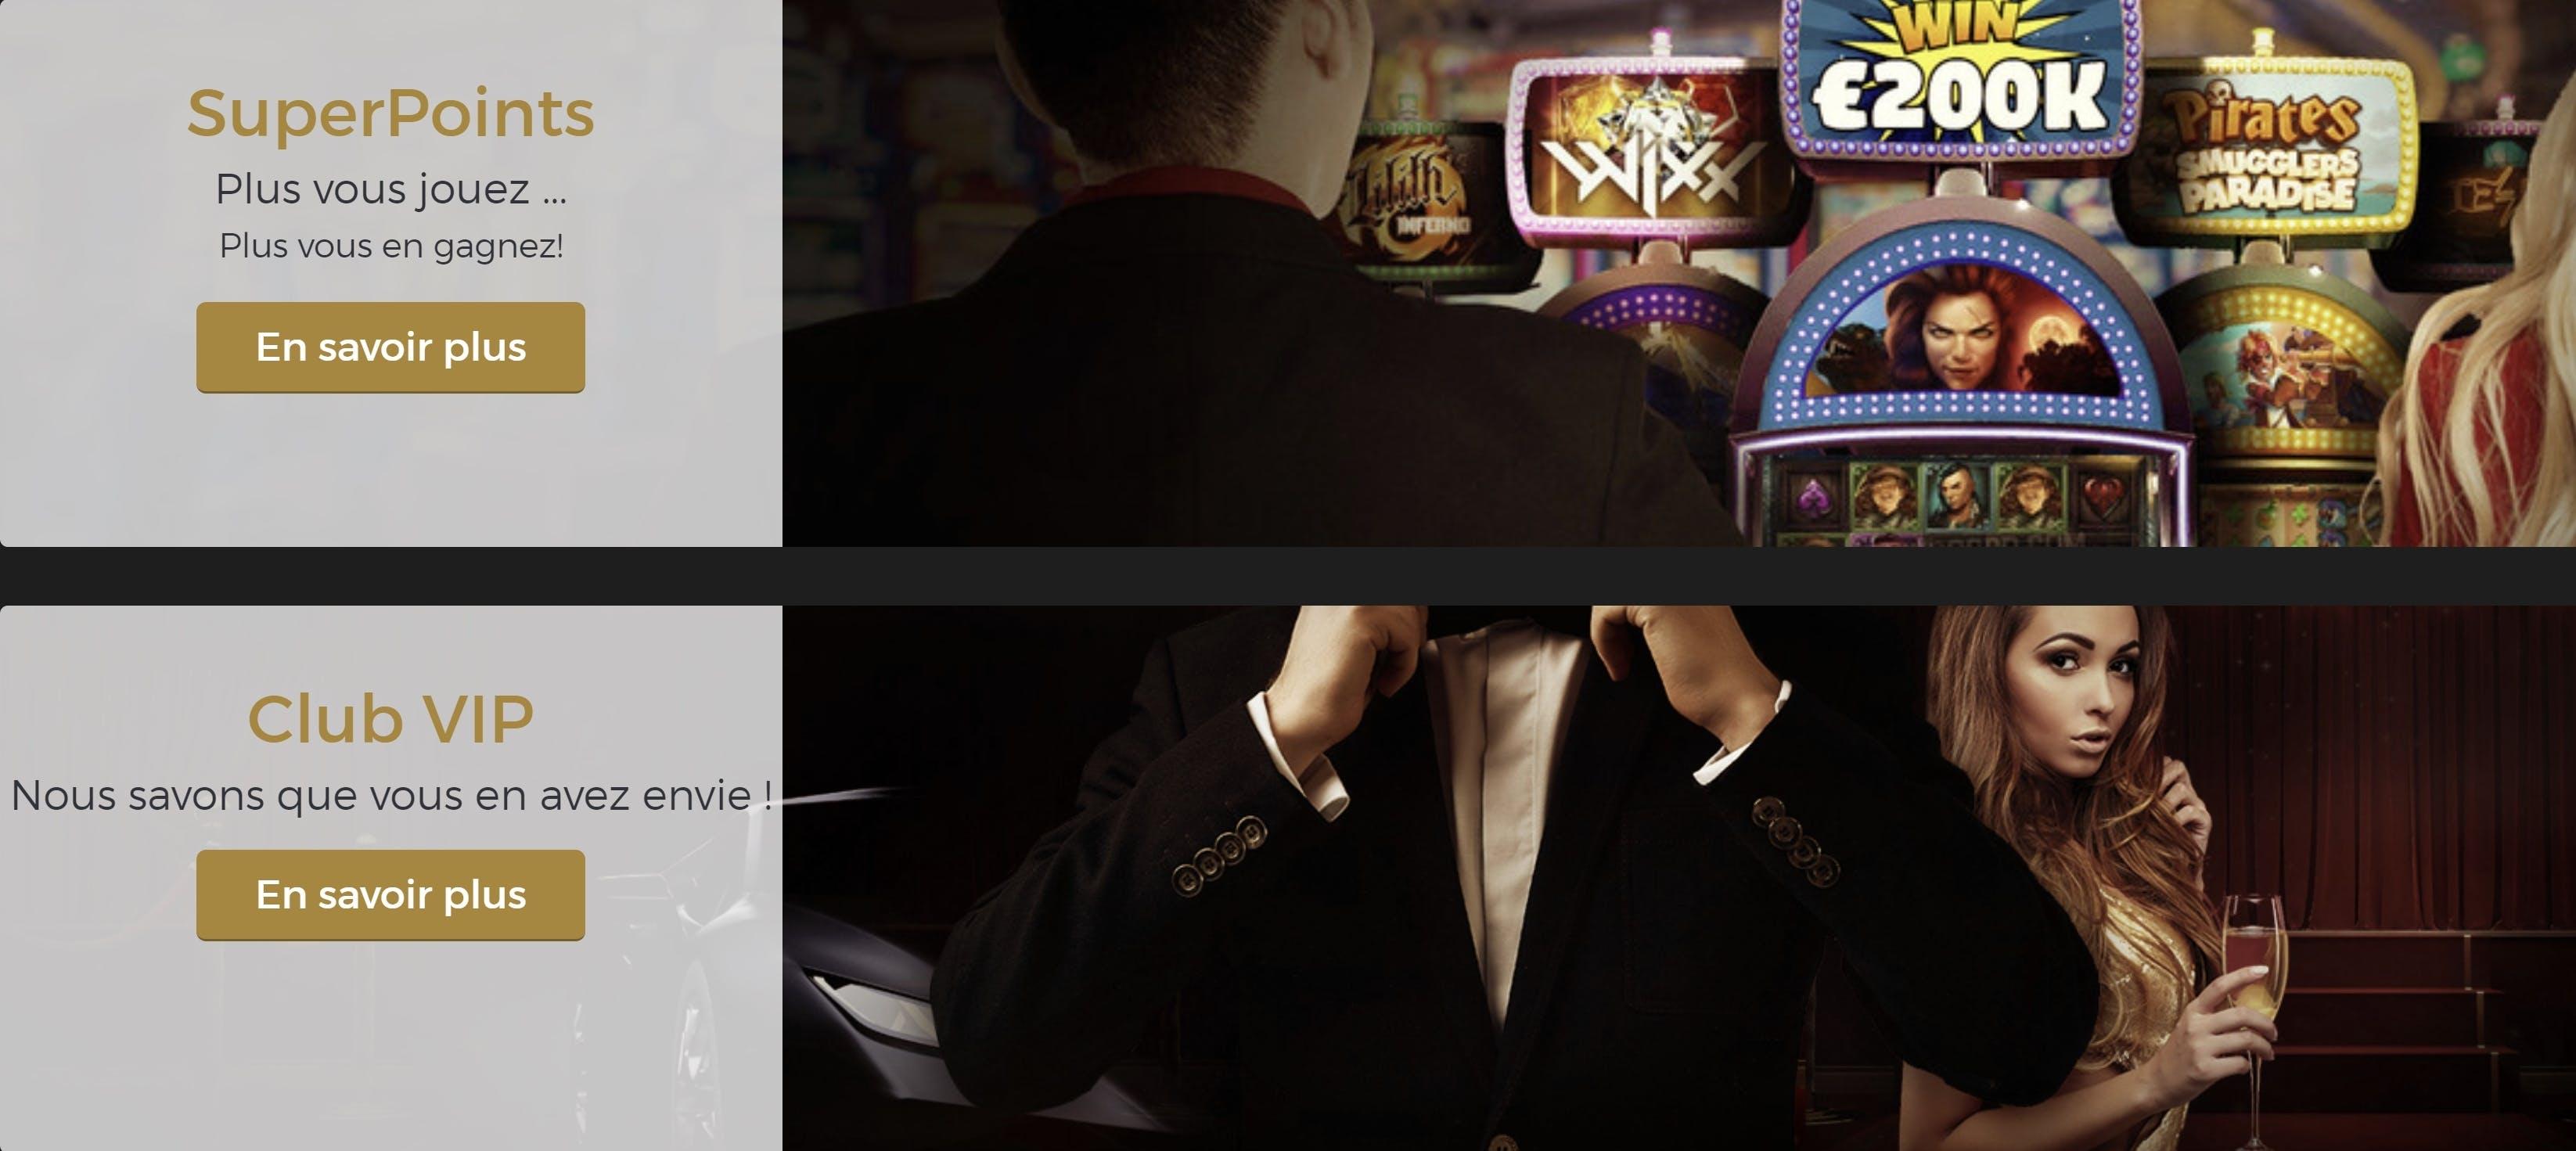 Extra Casino promotions